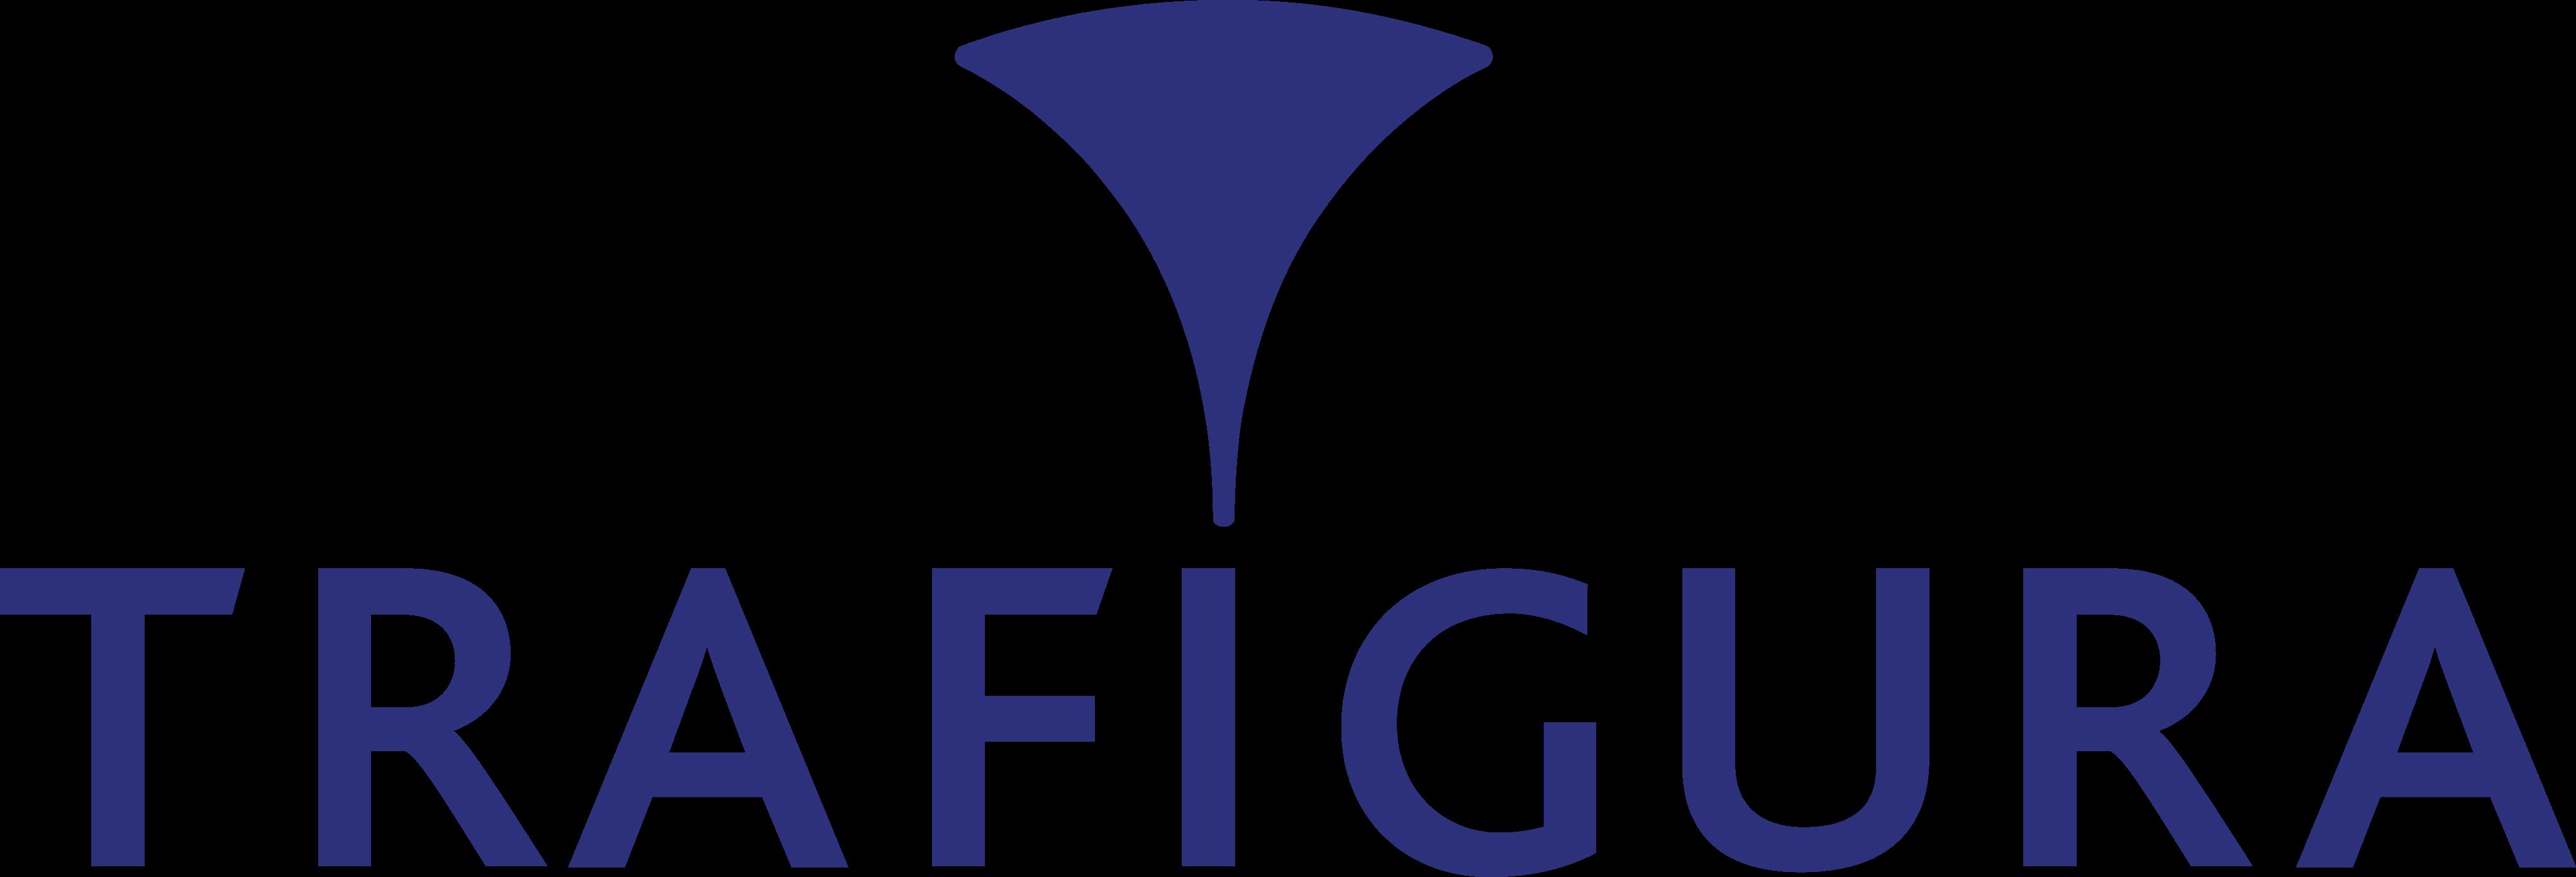 trafigura logo - Trafigura Logo